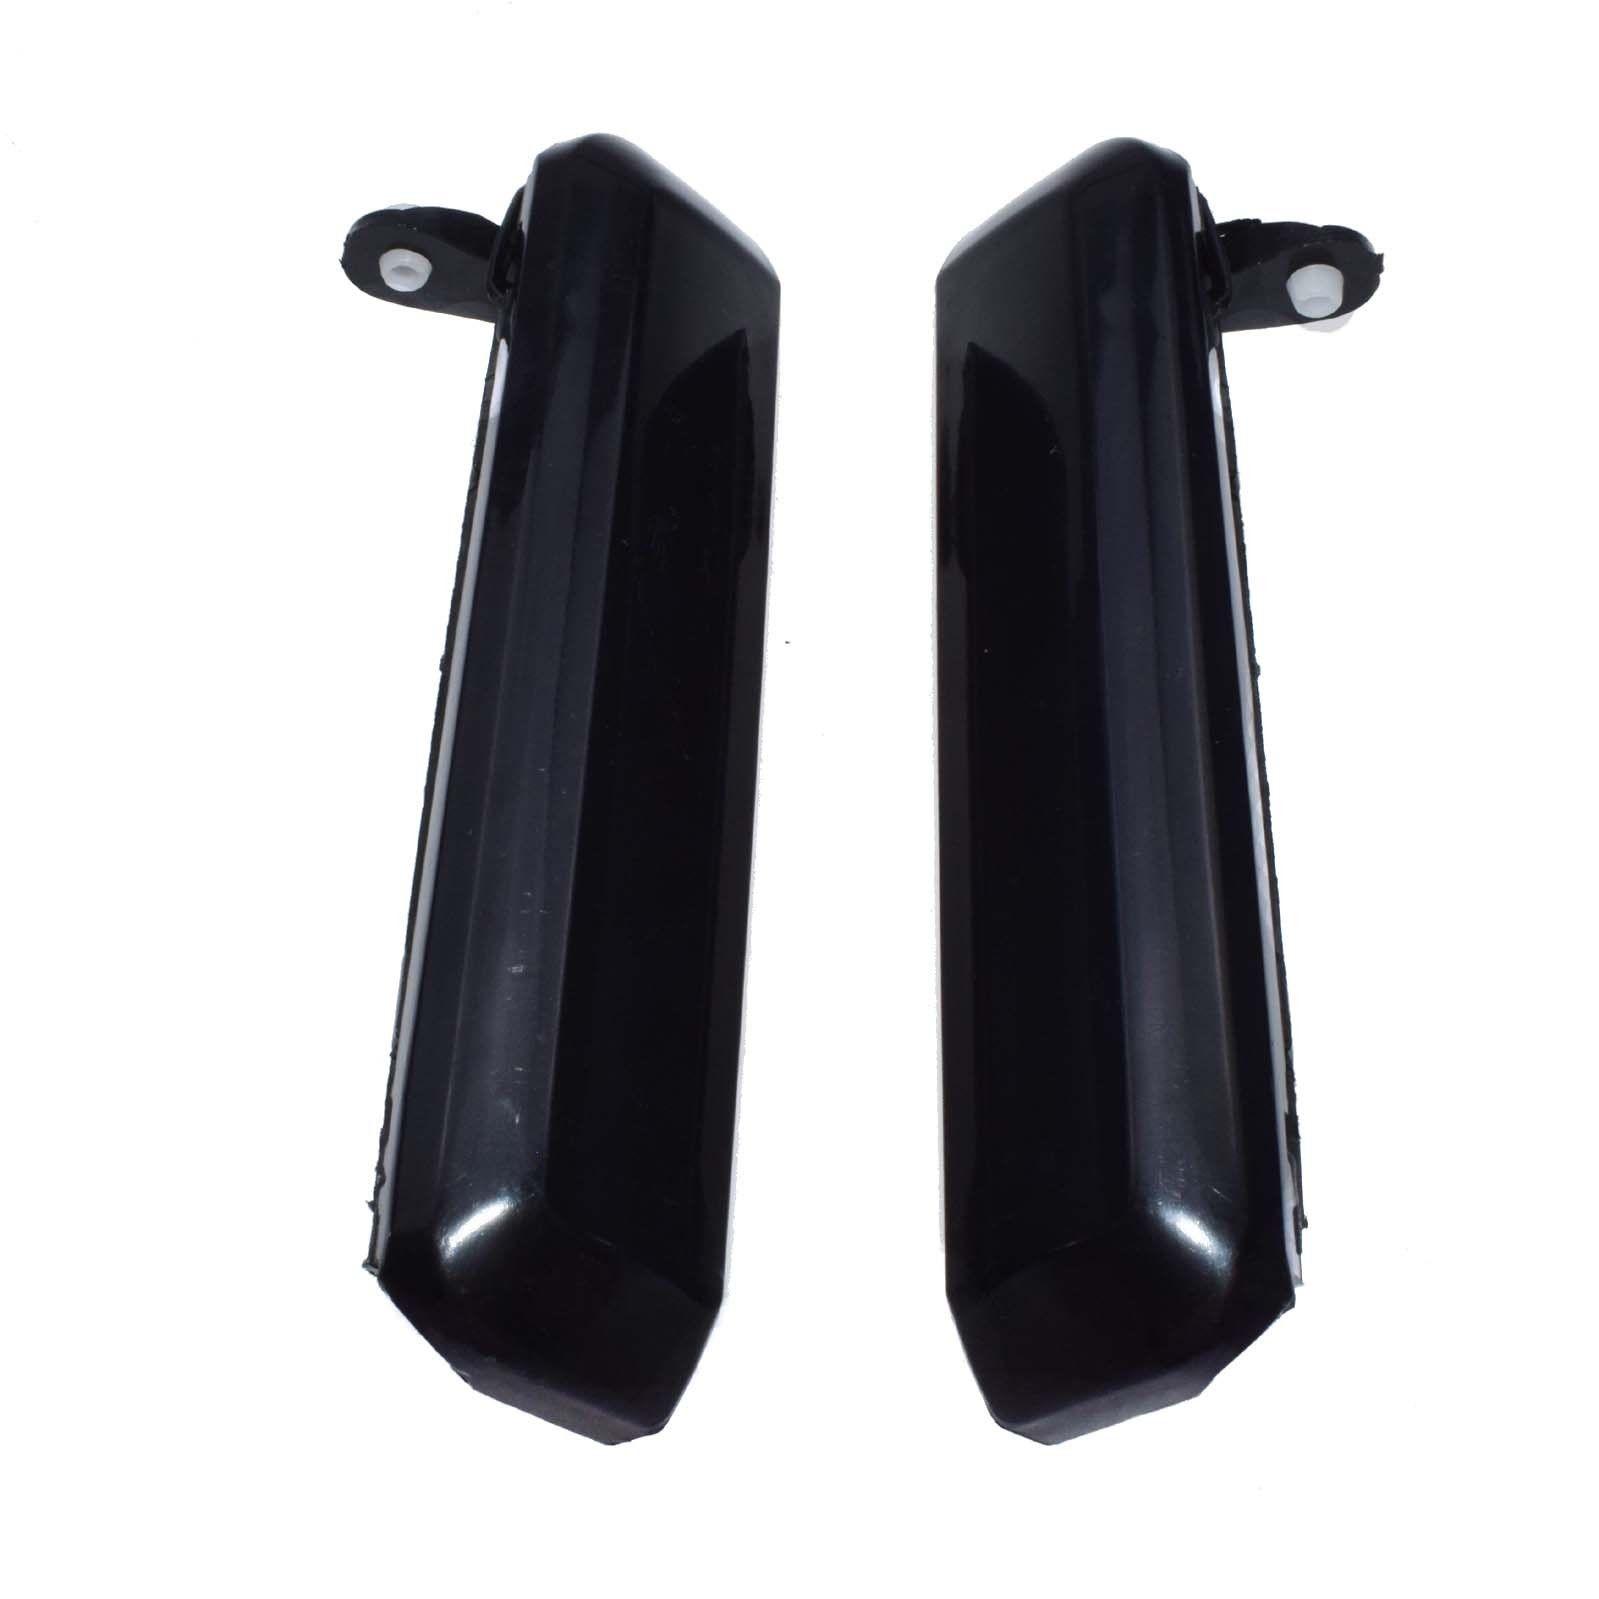 1Pair Exterior Door Handle Front Left /& Right For 95-97 Nissan Pickup 86-94 D21